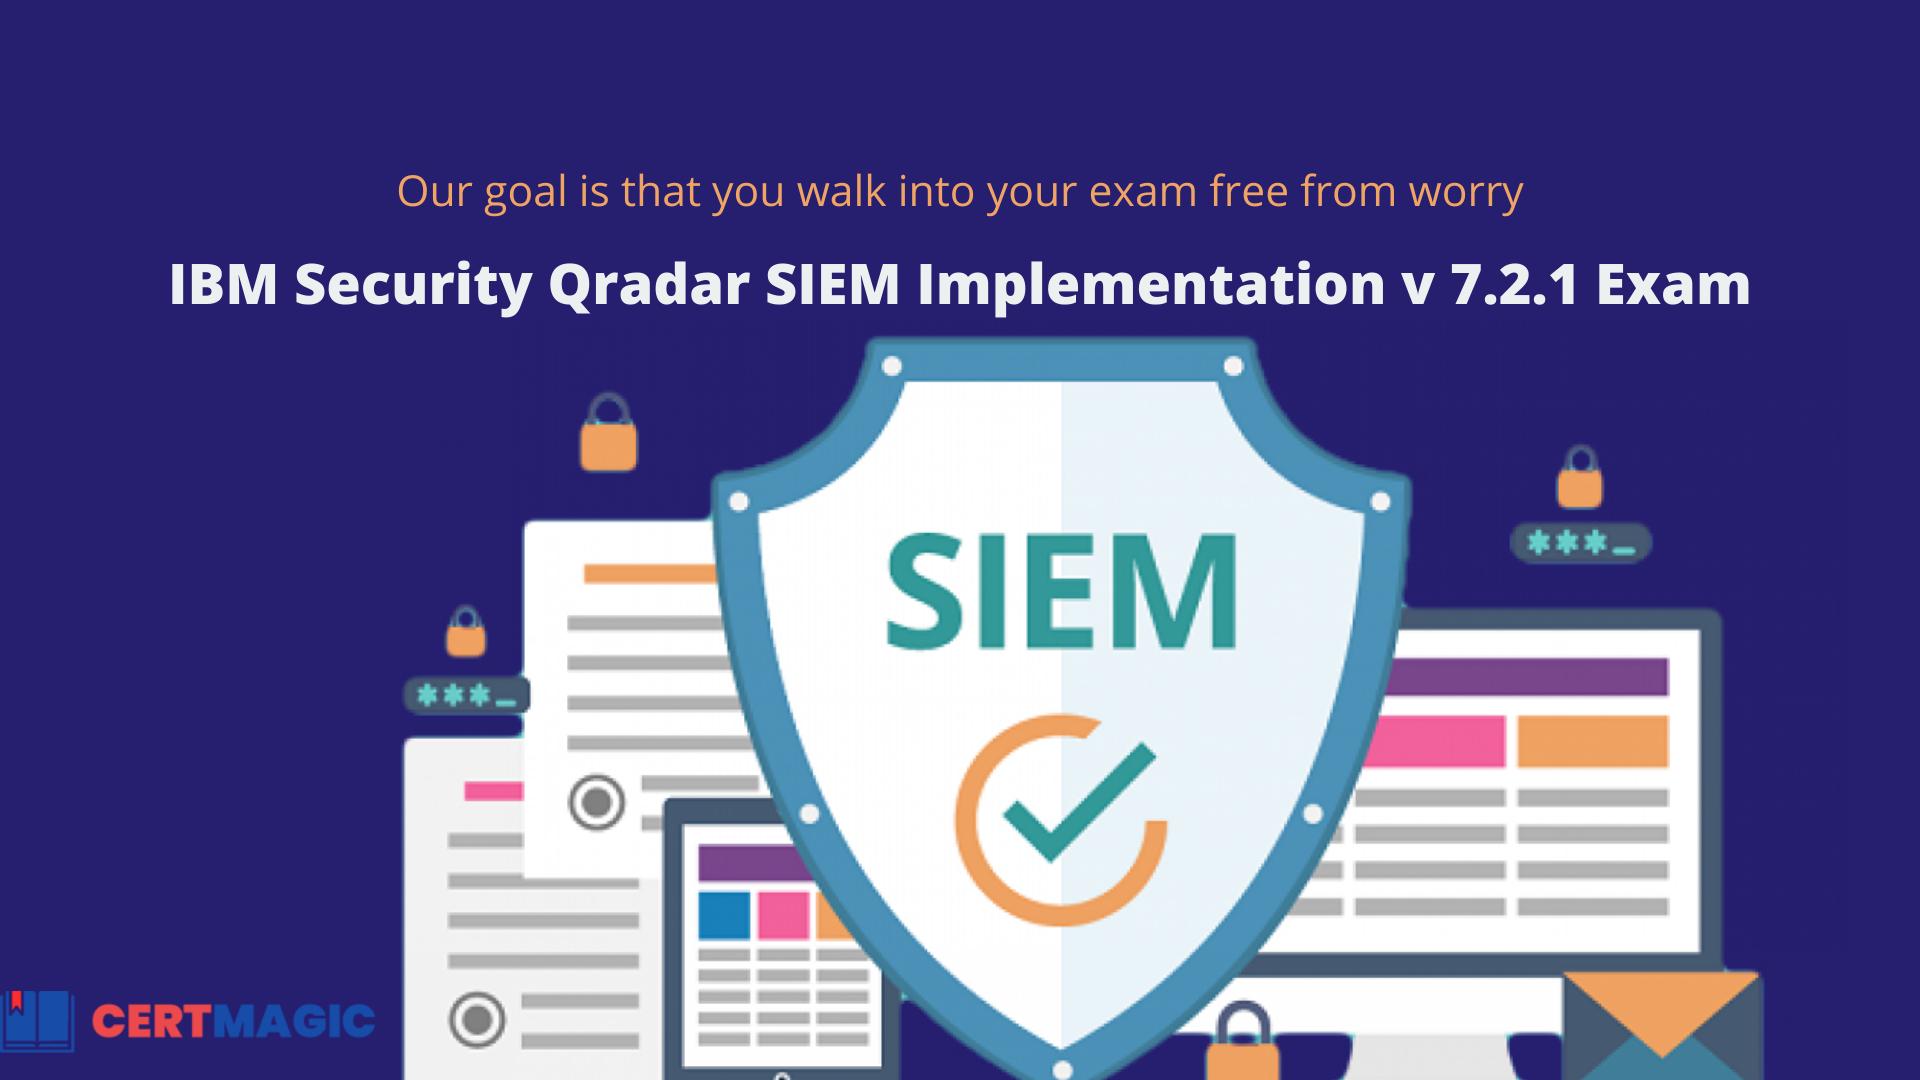 Ibm Security Exam In 2020 Exam Ibm Learning